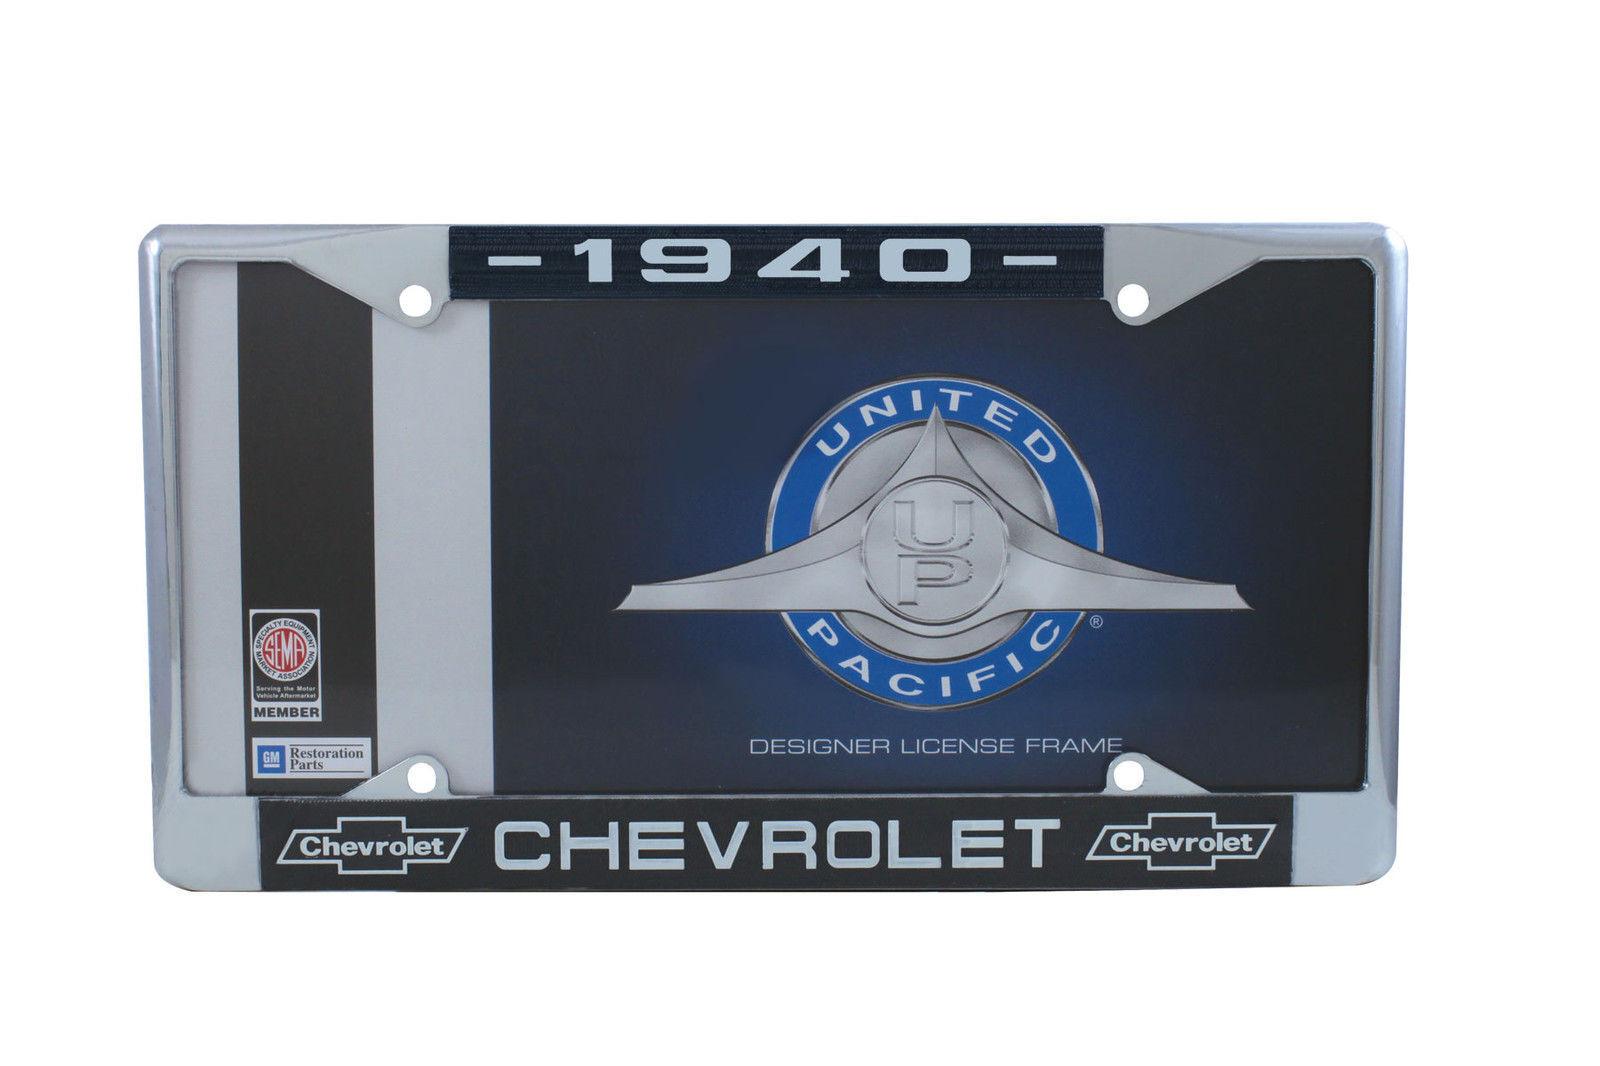 NEW PAIR 1940 CHEVROLET METAL LICENSE PLATE FRAME CAR OR TRUCK GM LICENSED